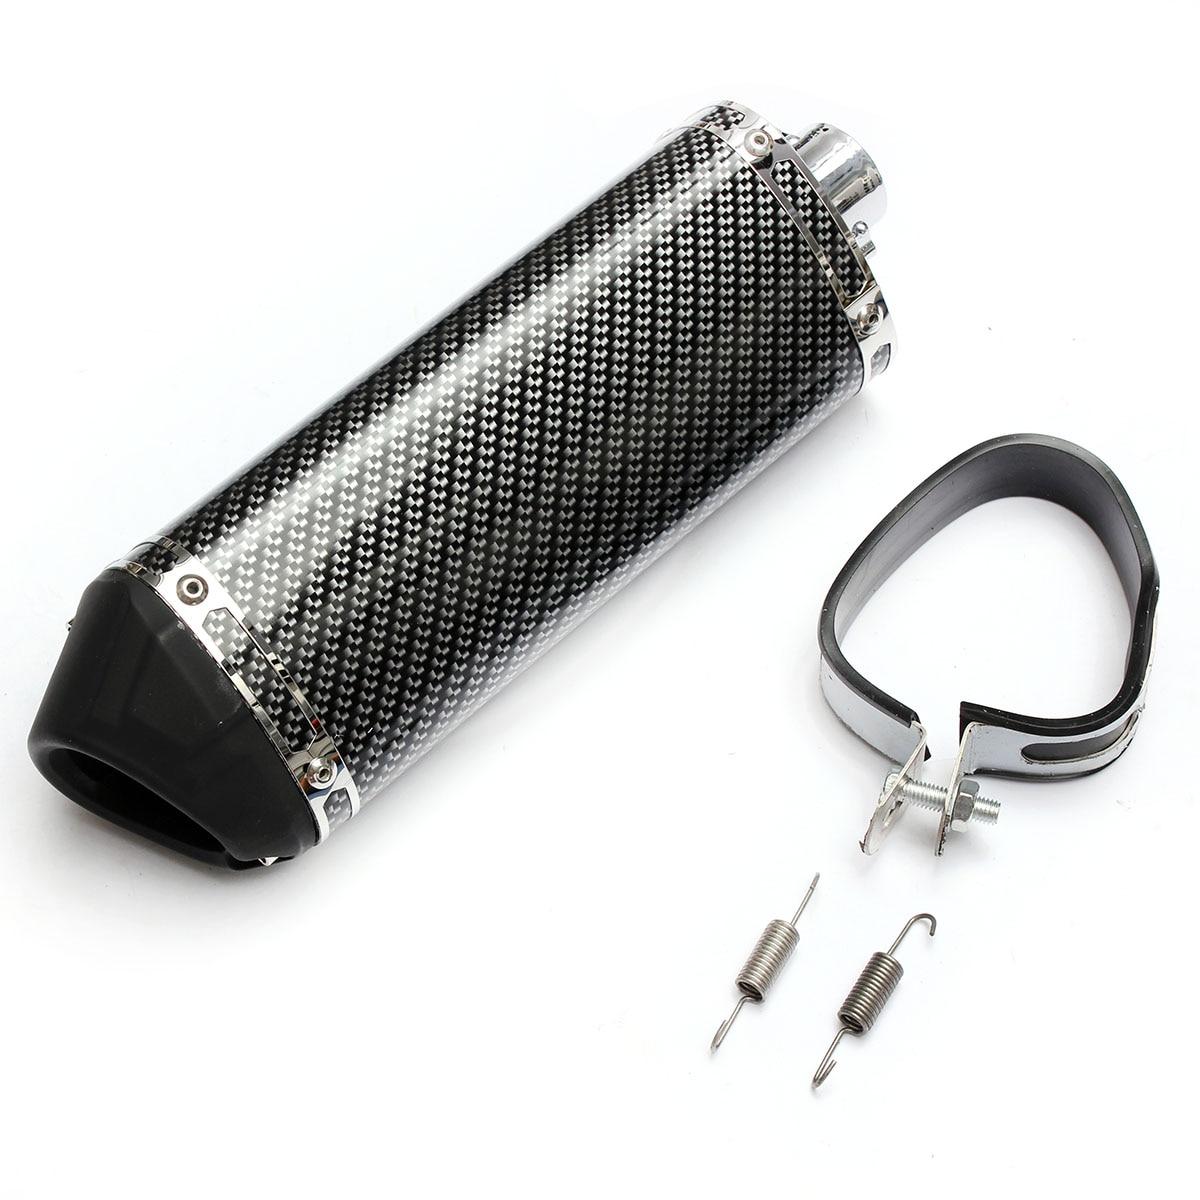 Cor da fibra de carbono 320mm tubo silenciador do escape da motocicleta com silenciador móvel universal para honda yamaha